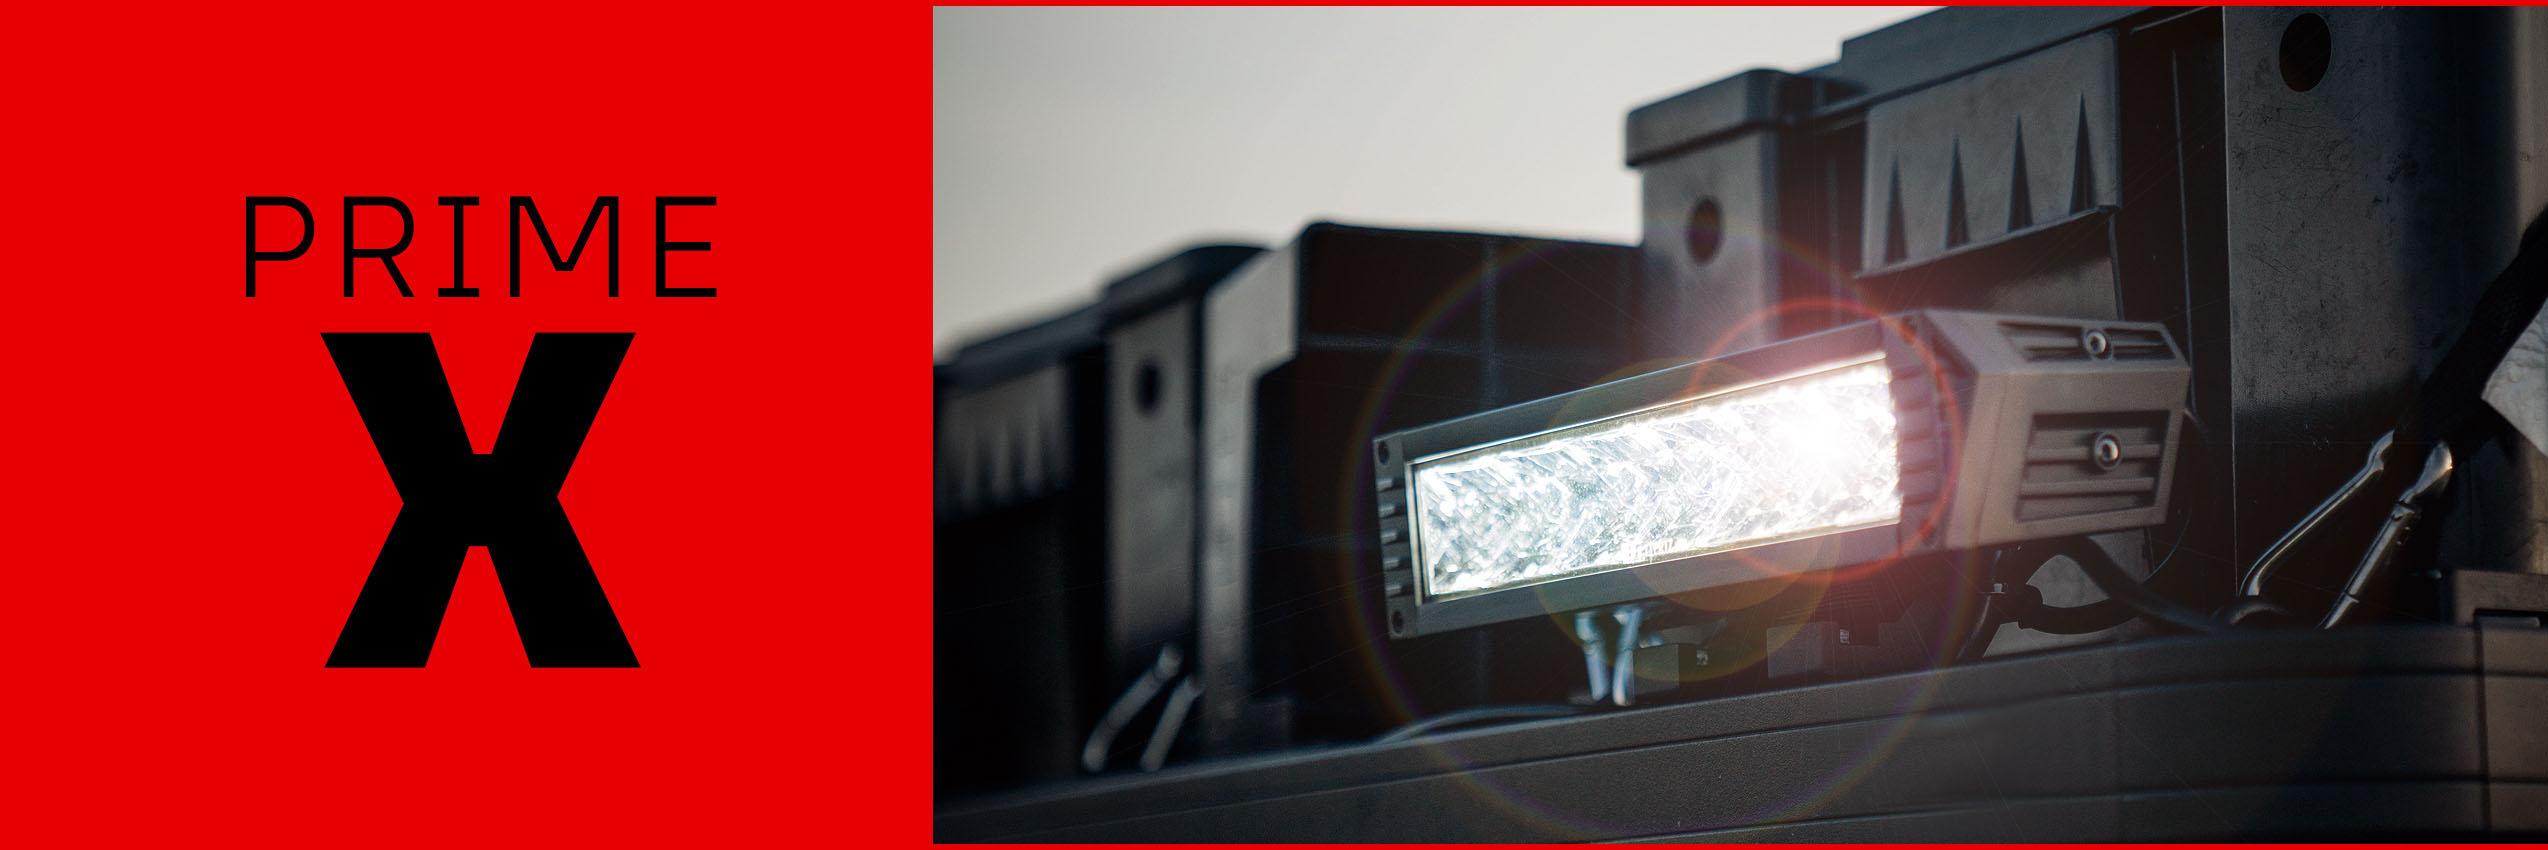 WLD-WI-LTPZ-PX11E-1-Lightpart-Prime-X11Prime_X_Banner_2548x850_02